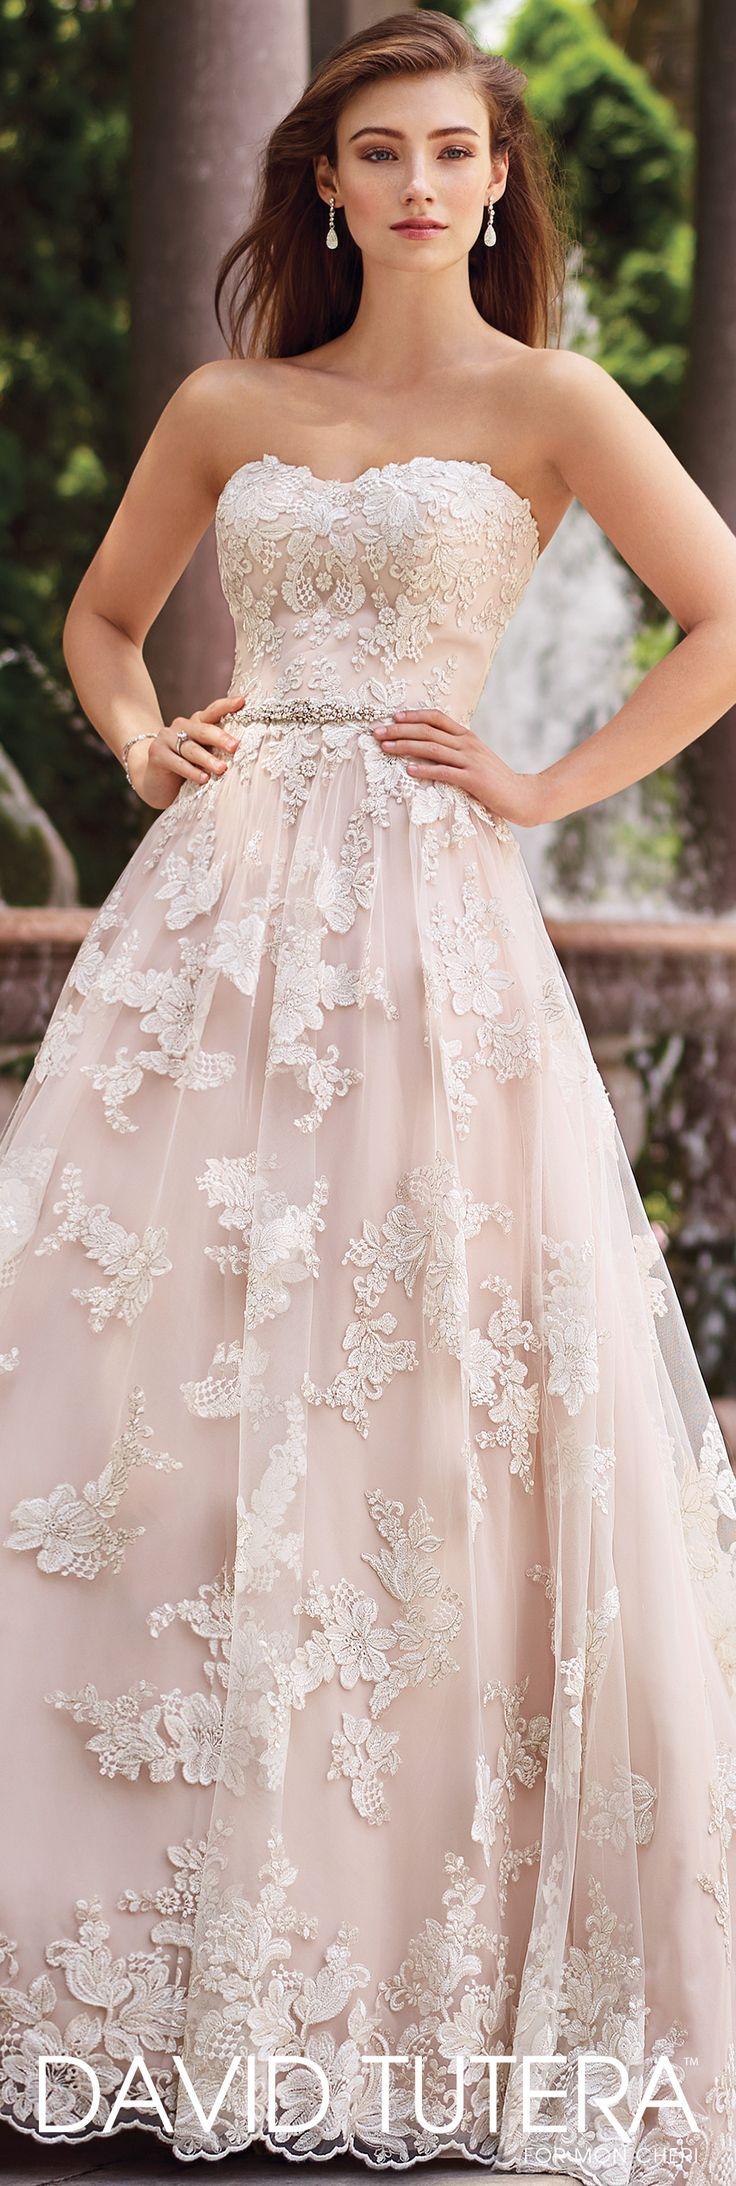 pink wedding dresses colored wedding dress Hand Beaded A Line Wedding Dress Tala David Tutera